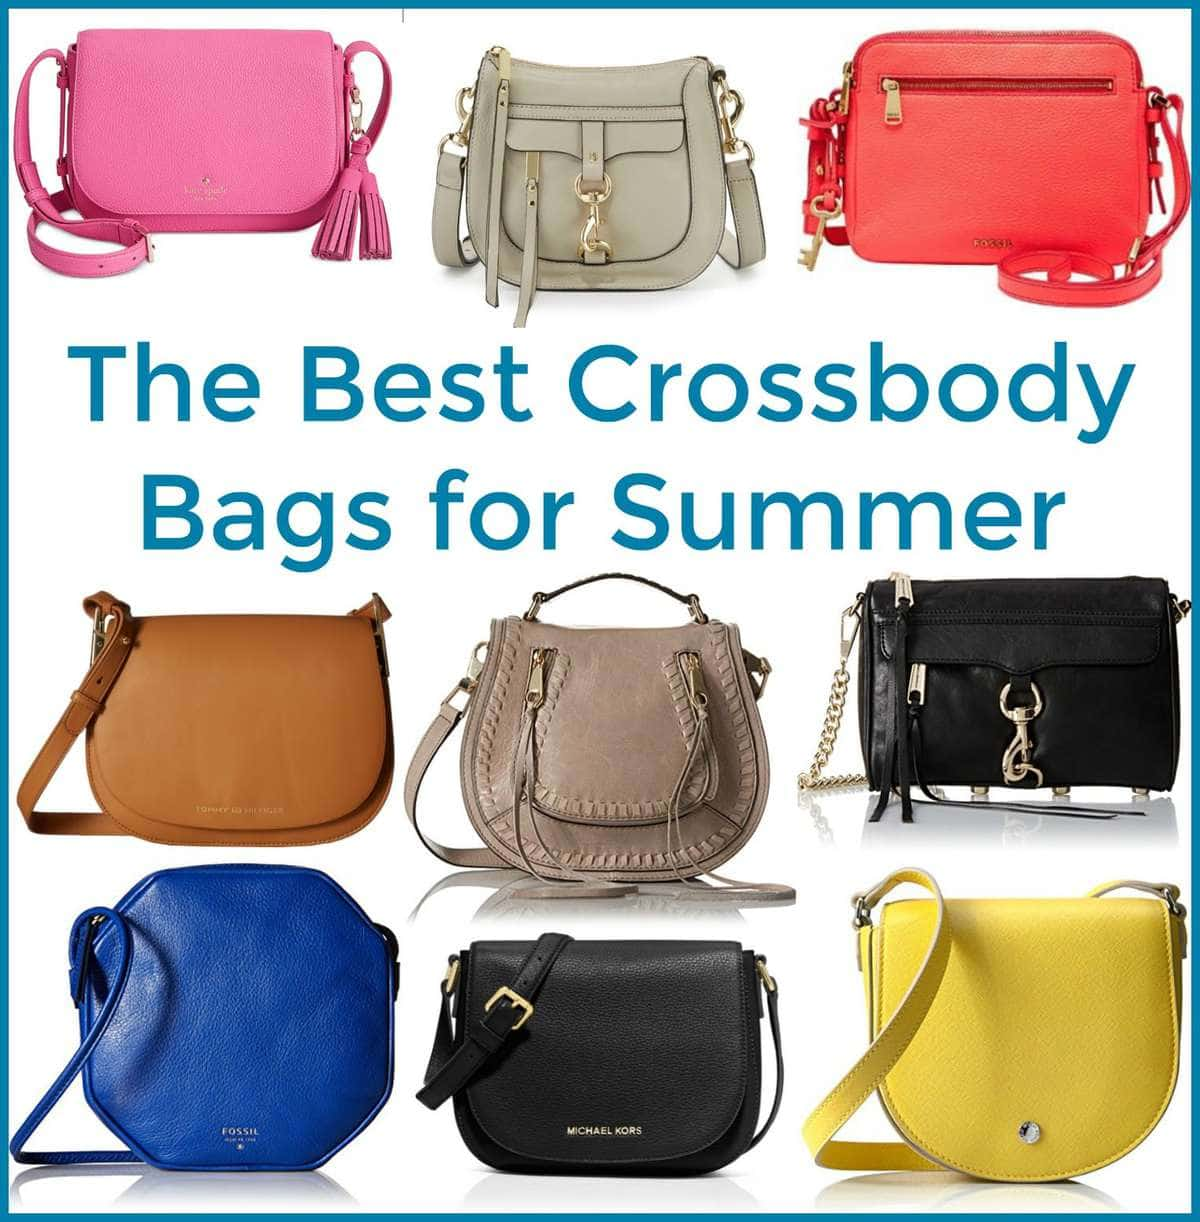 Jennifer PU Leather Top-Handle Handbags Dandelion Painting Single-Shoulder Tote Crossbody Bag Messenger Bags For Women